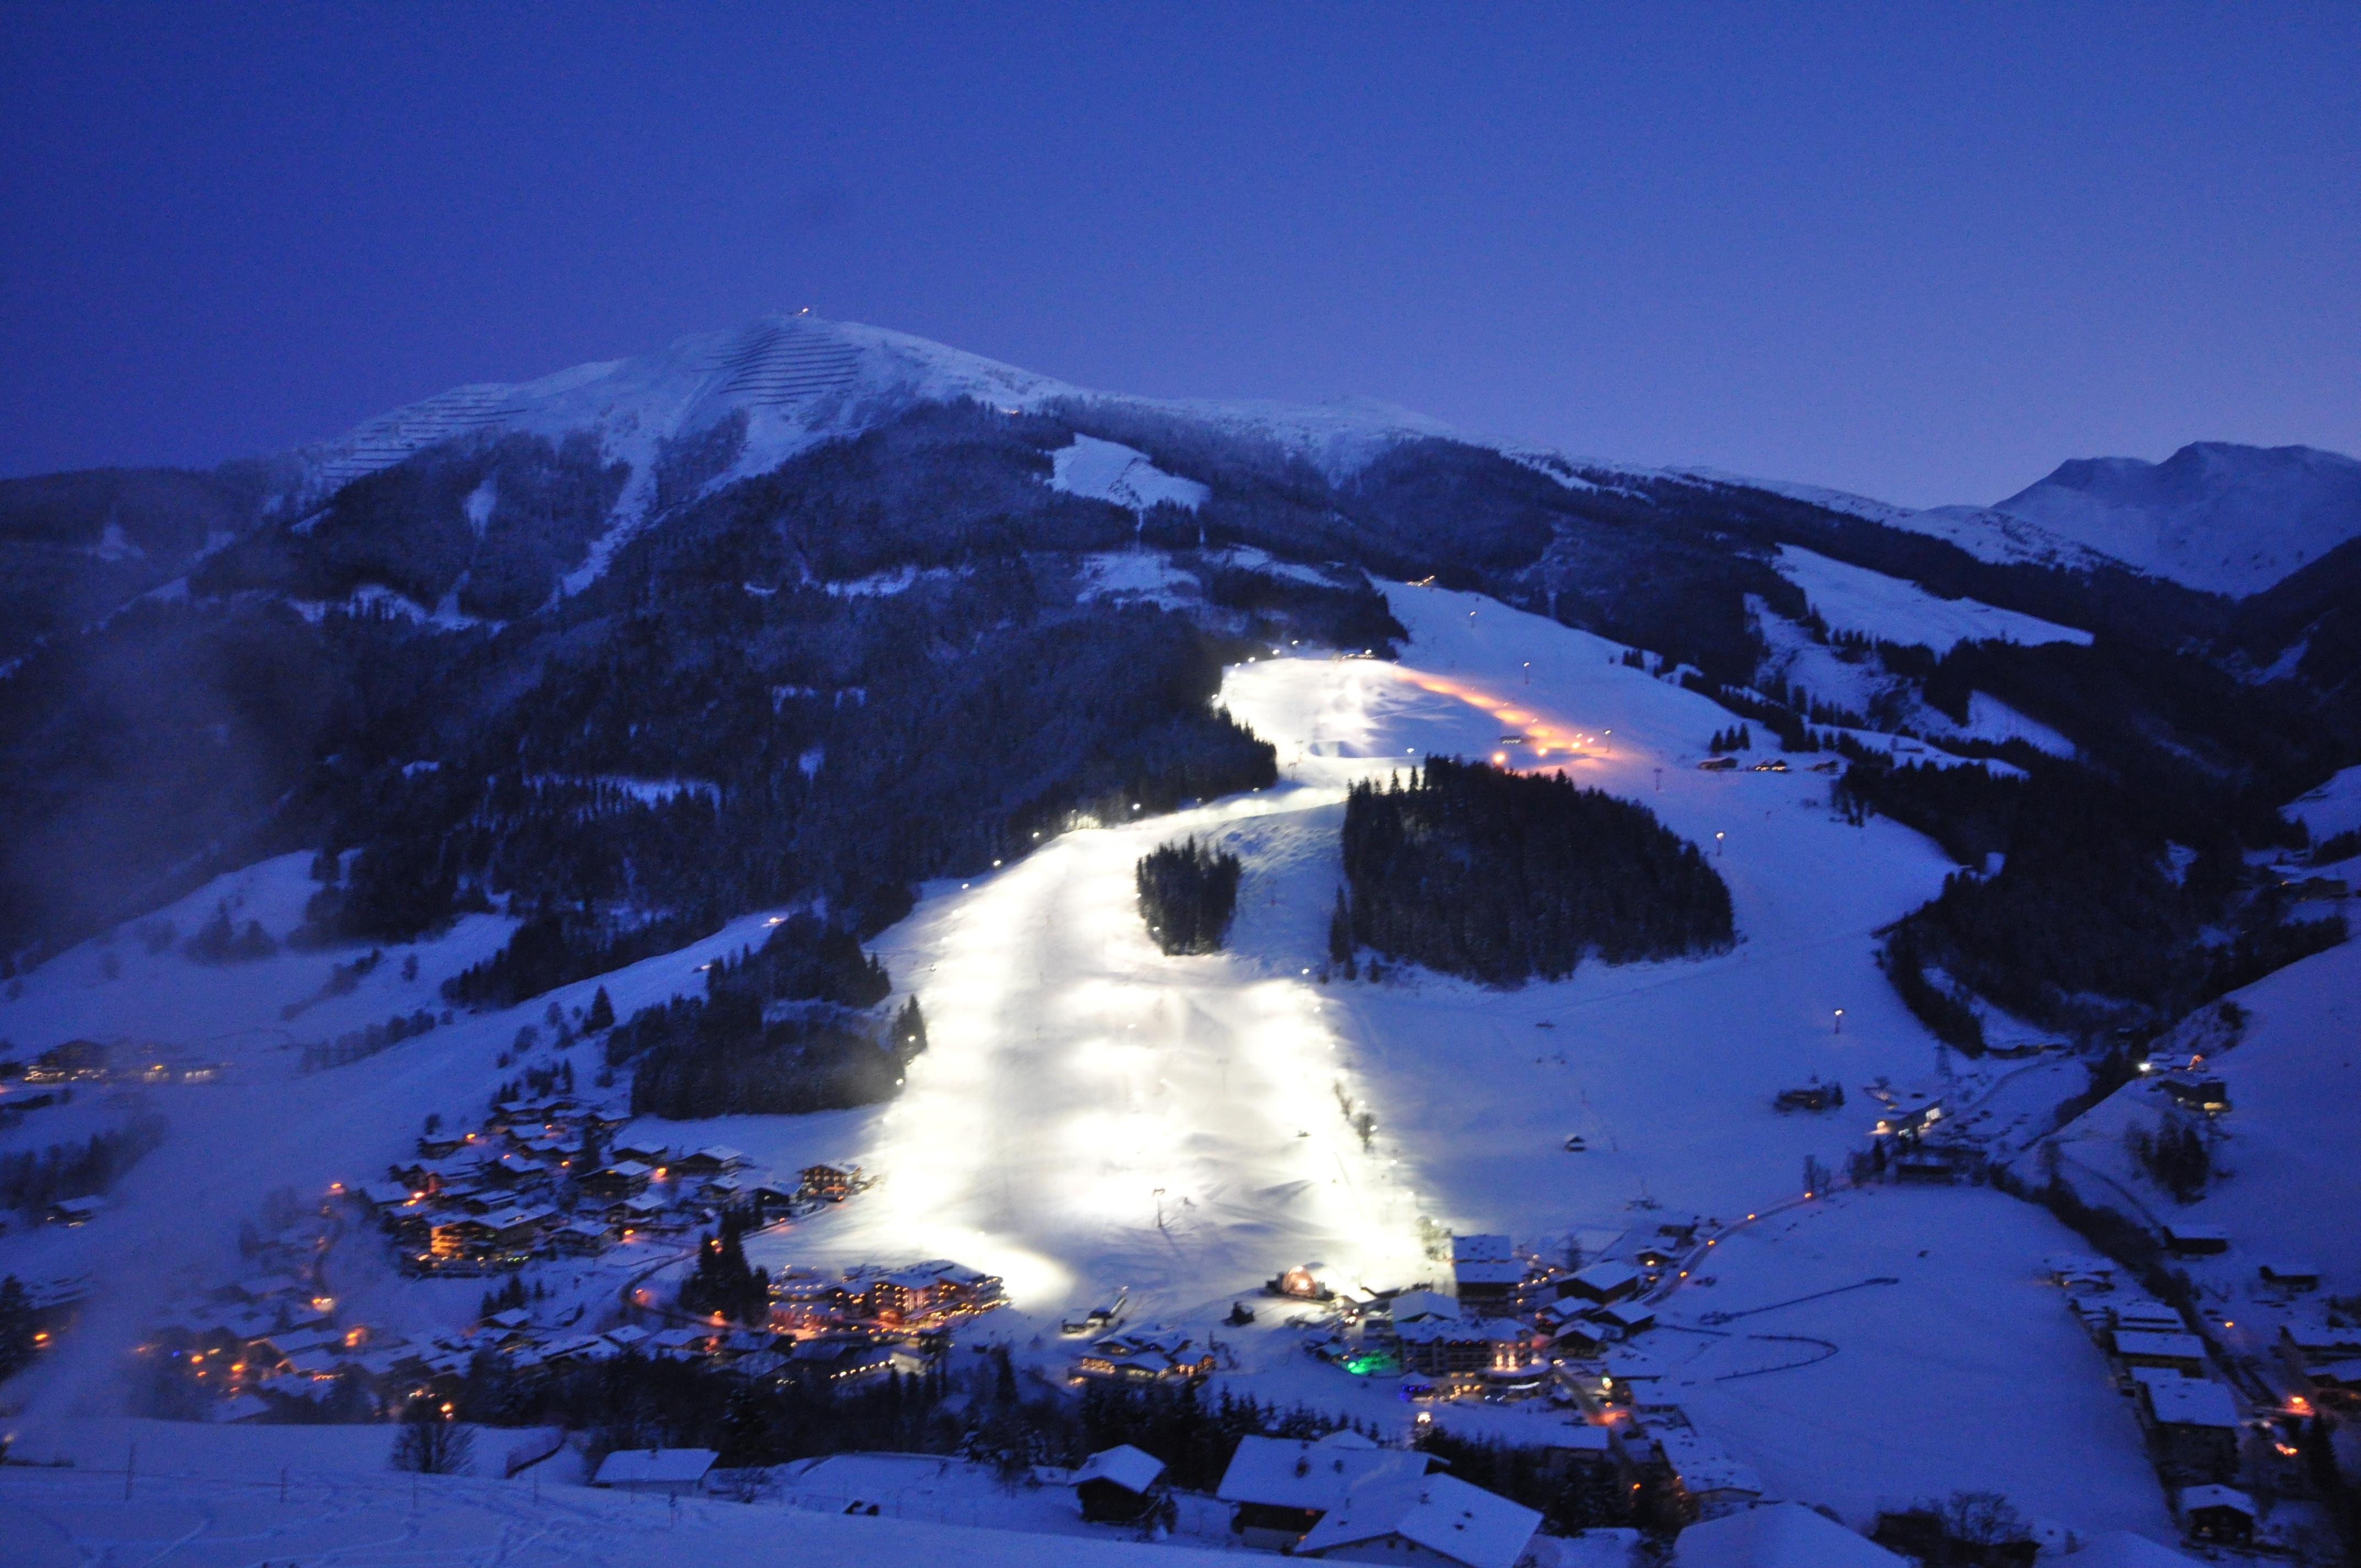 ski slopes in the ski resort Saalbach Hinterglemm Austria wallpapers 4288x2848